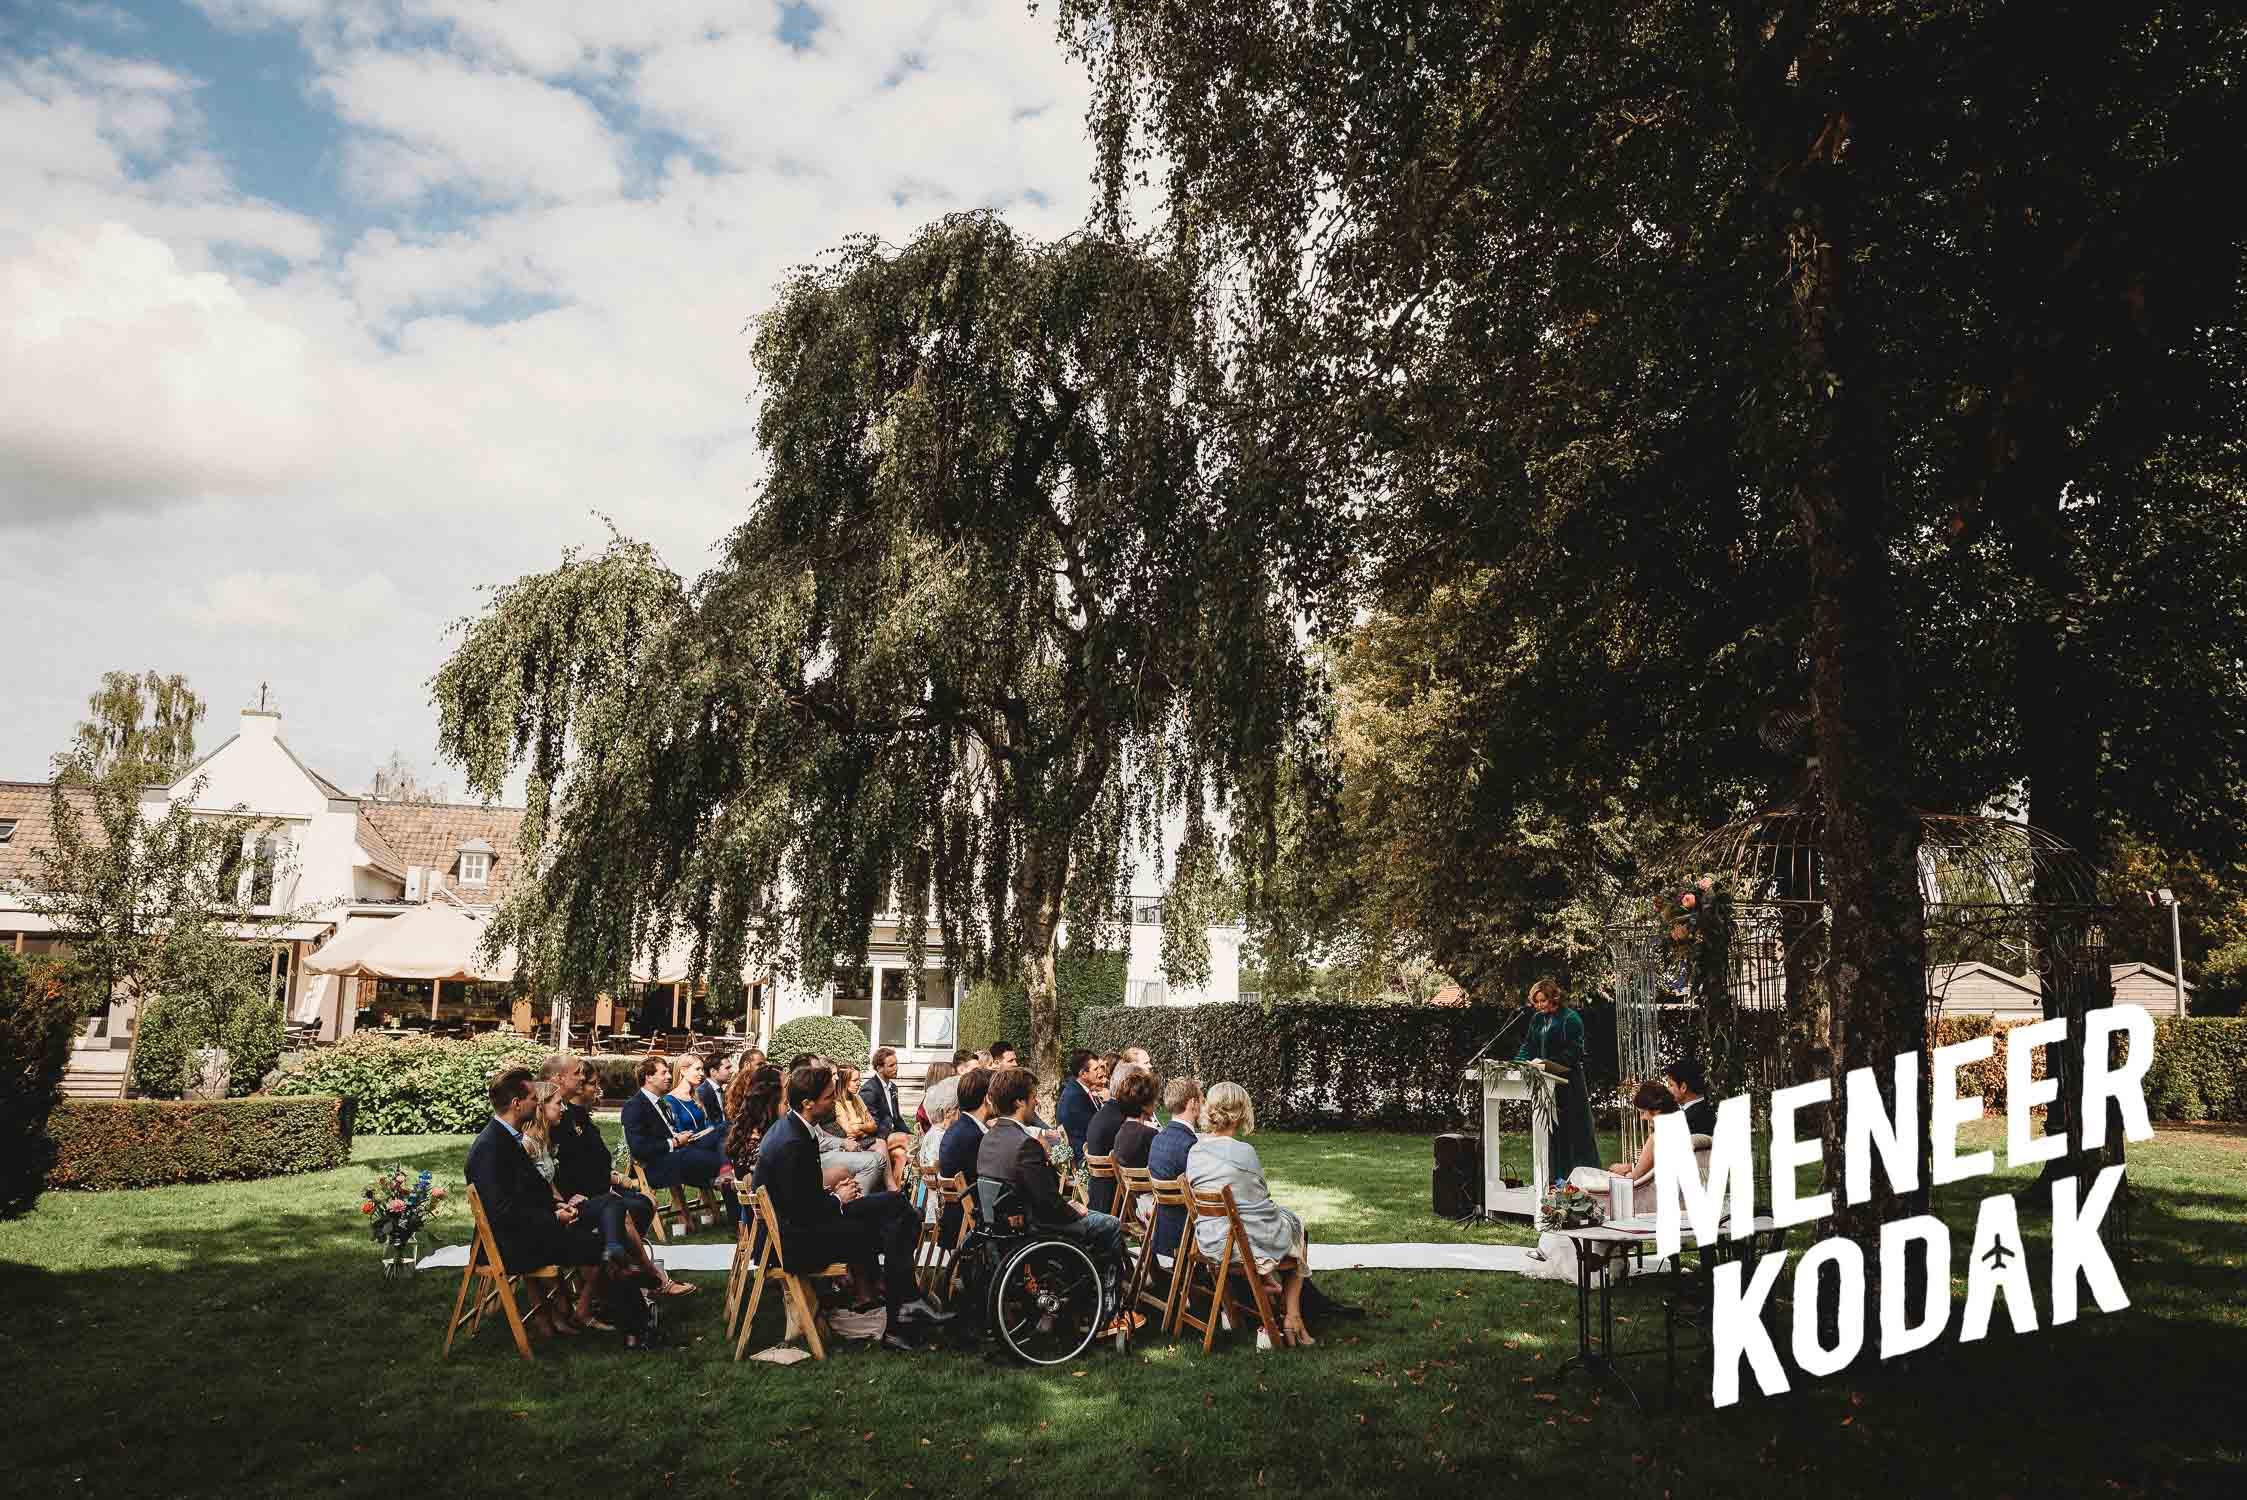 Meneer Kodak - Trouwreportage - Breda - E&M-098.jpg